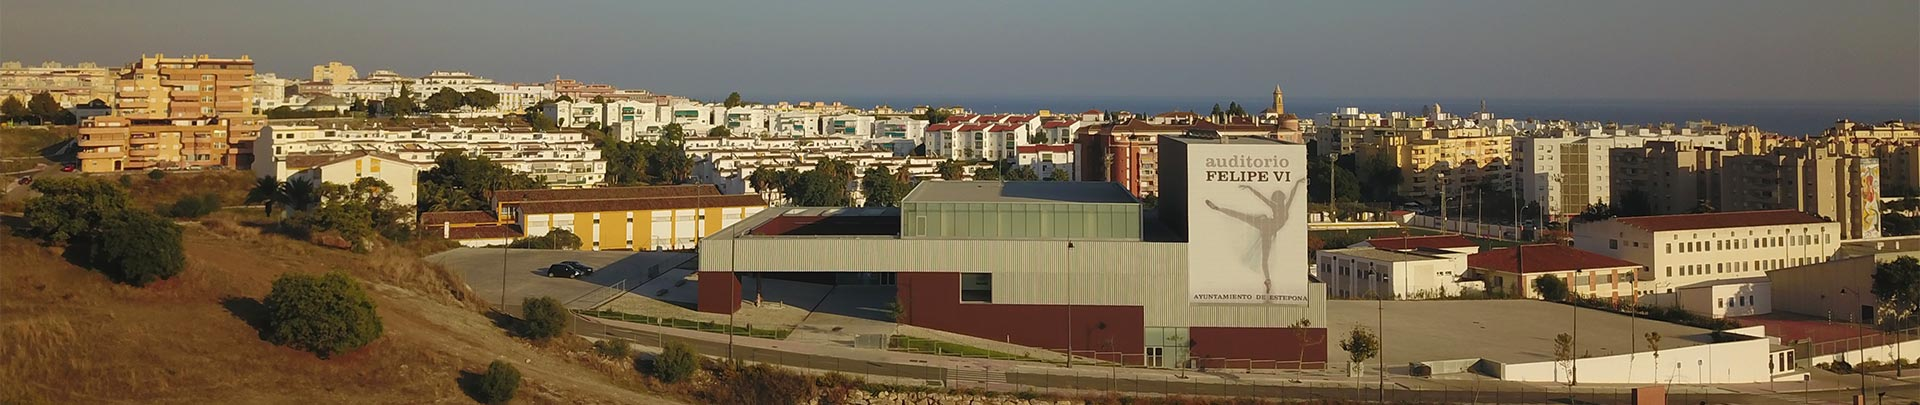 Estepona, Málaga, Costa del sol, Andalucía, España.